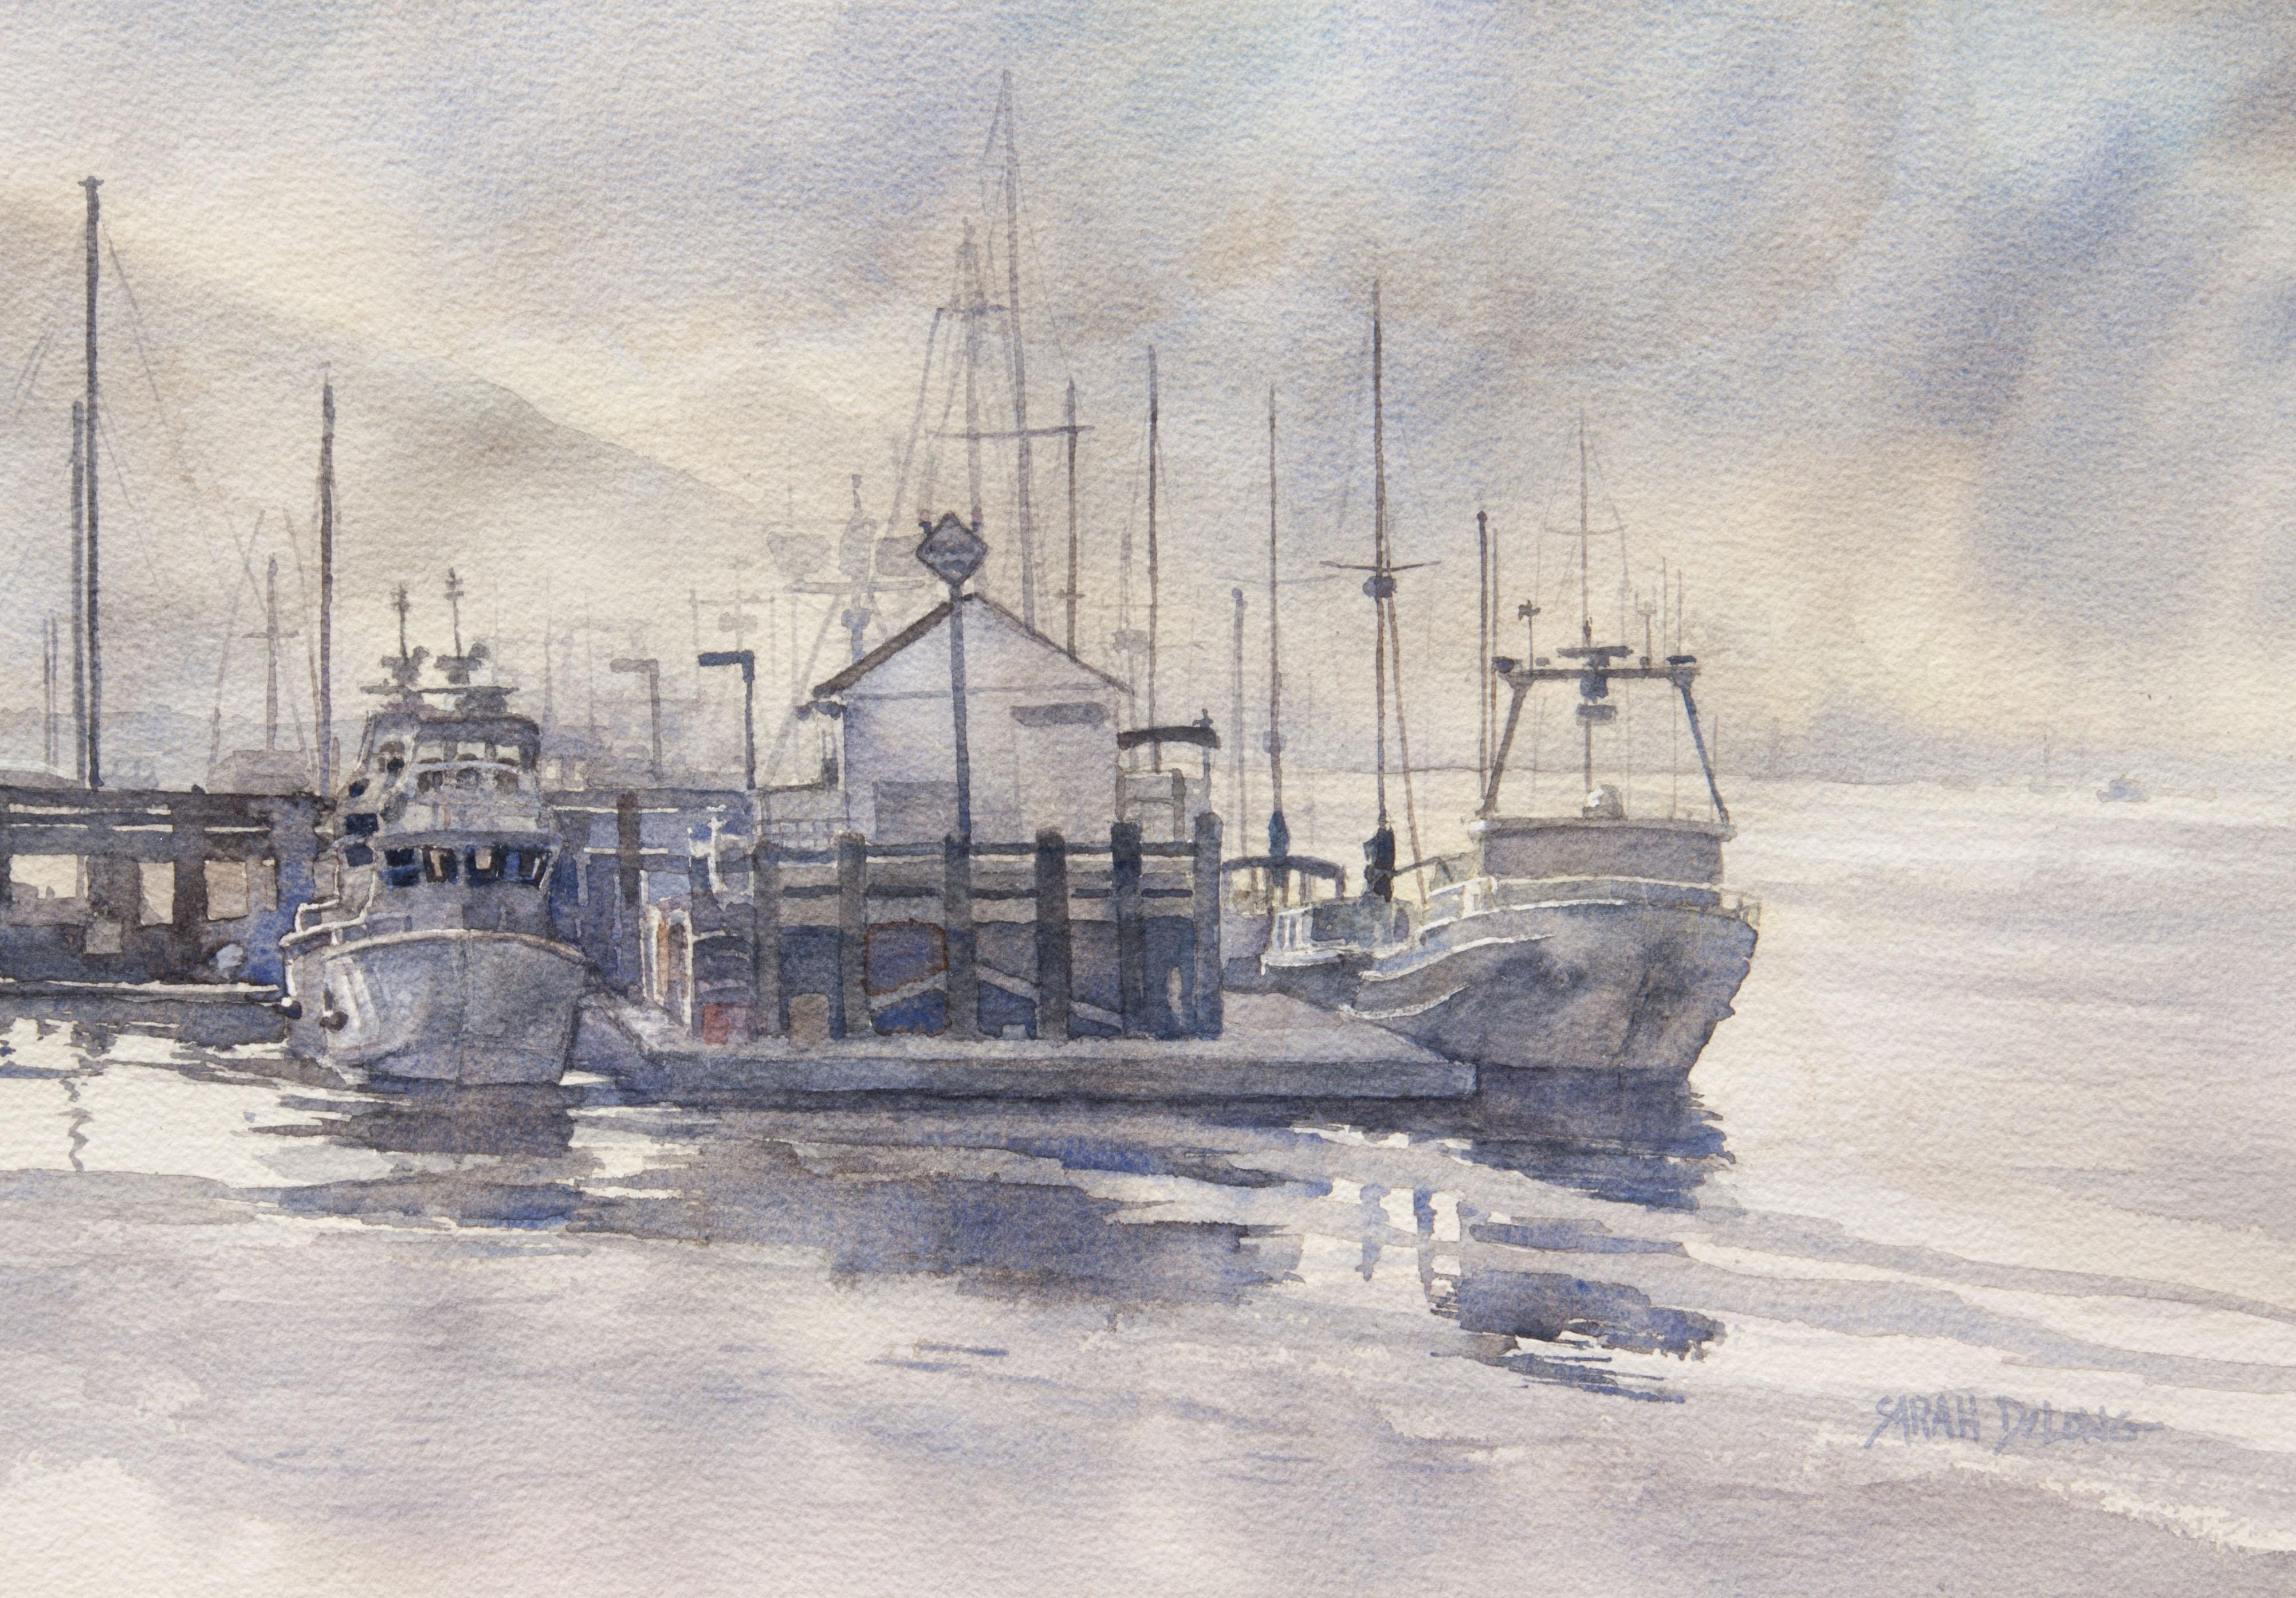 Coast Guard Morning